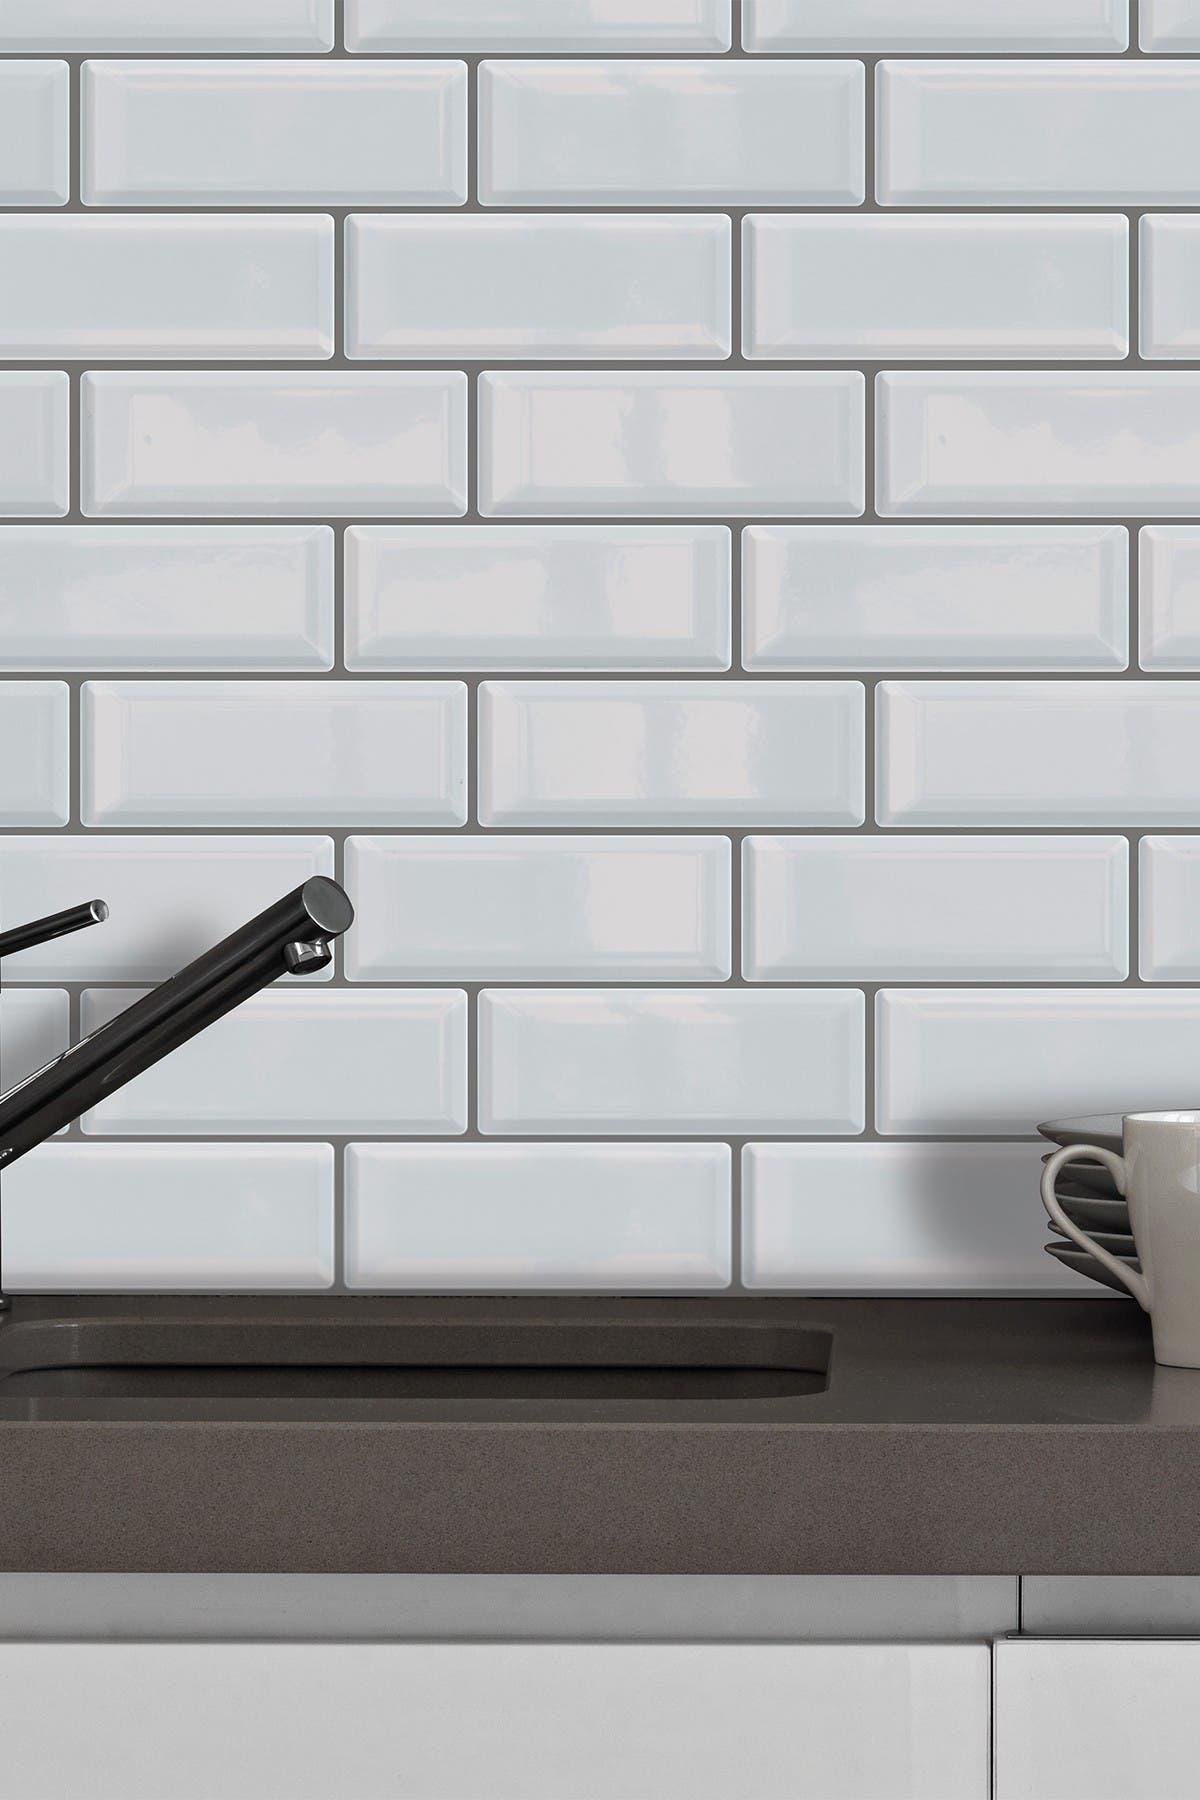 Image of WalPlus White Metro Glossy Sticker Tiles Premium Wall Splashbacks Mosaics